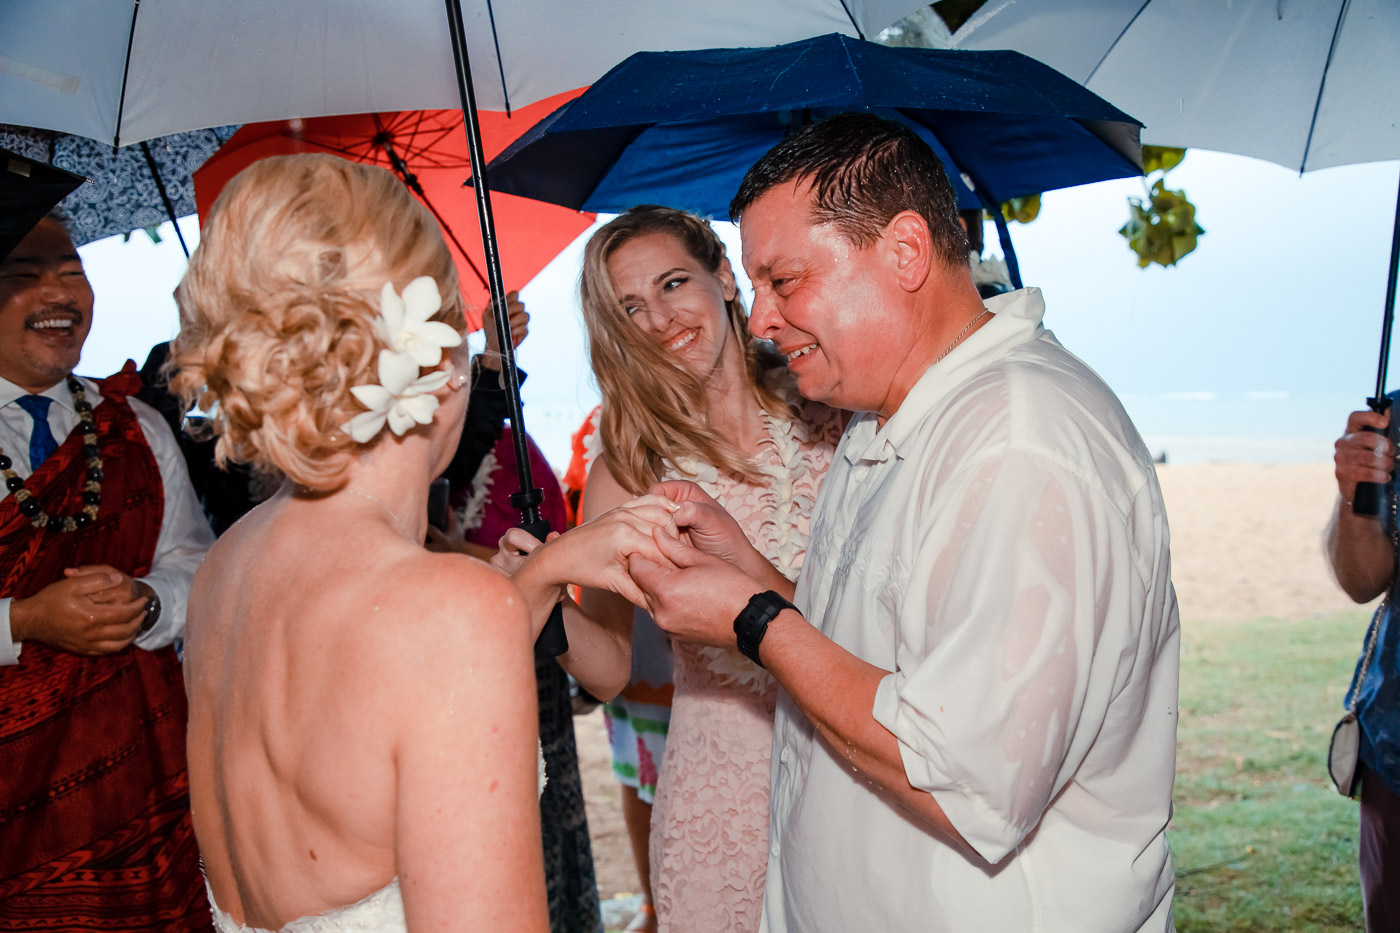 wedding-redux-41012.jpg